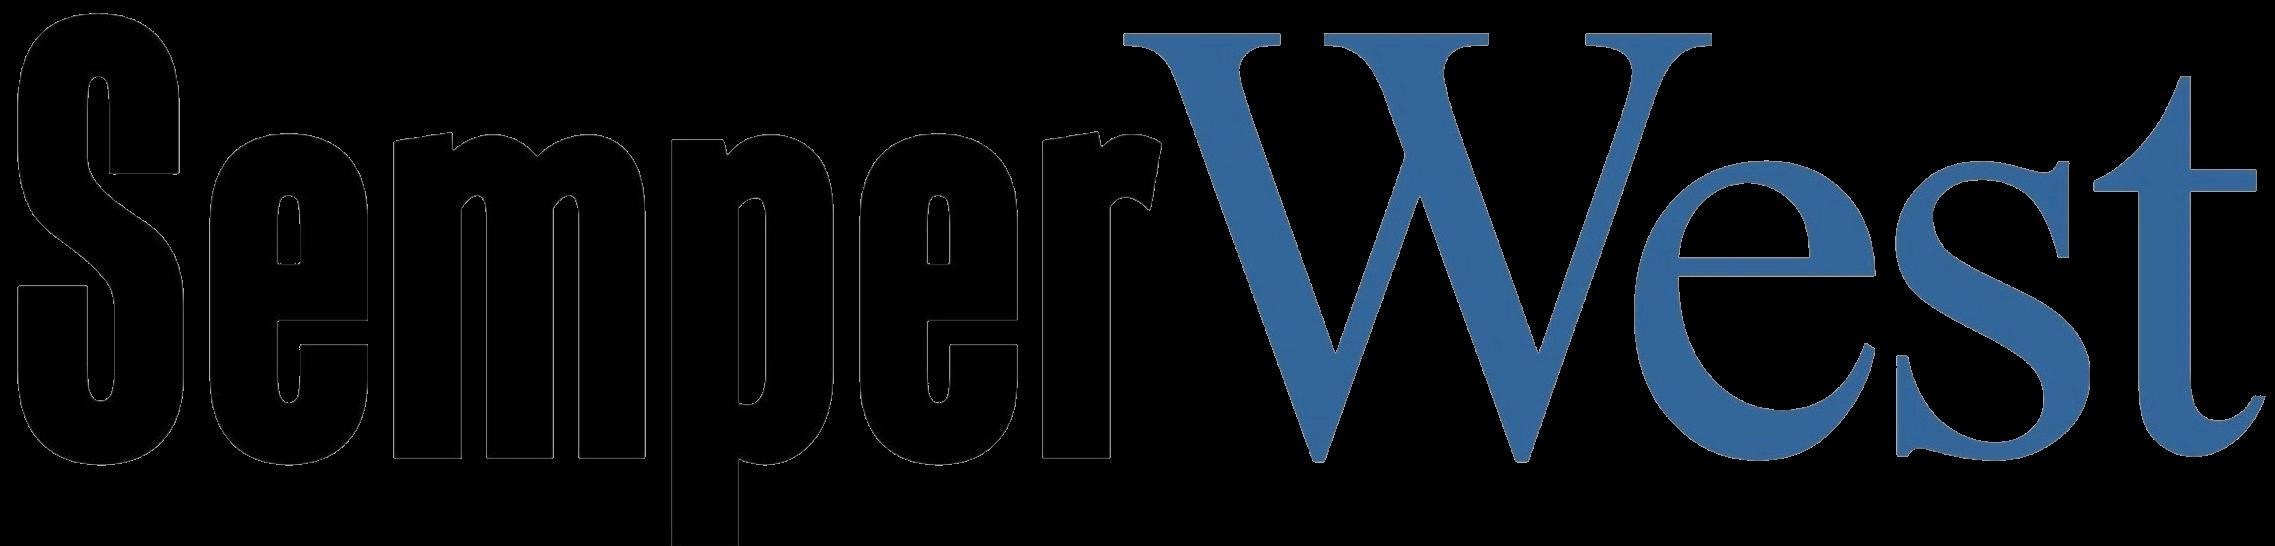 Semper West Roofing & Siding logo